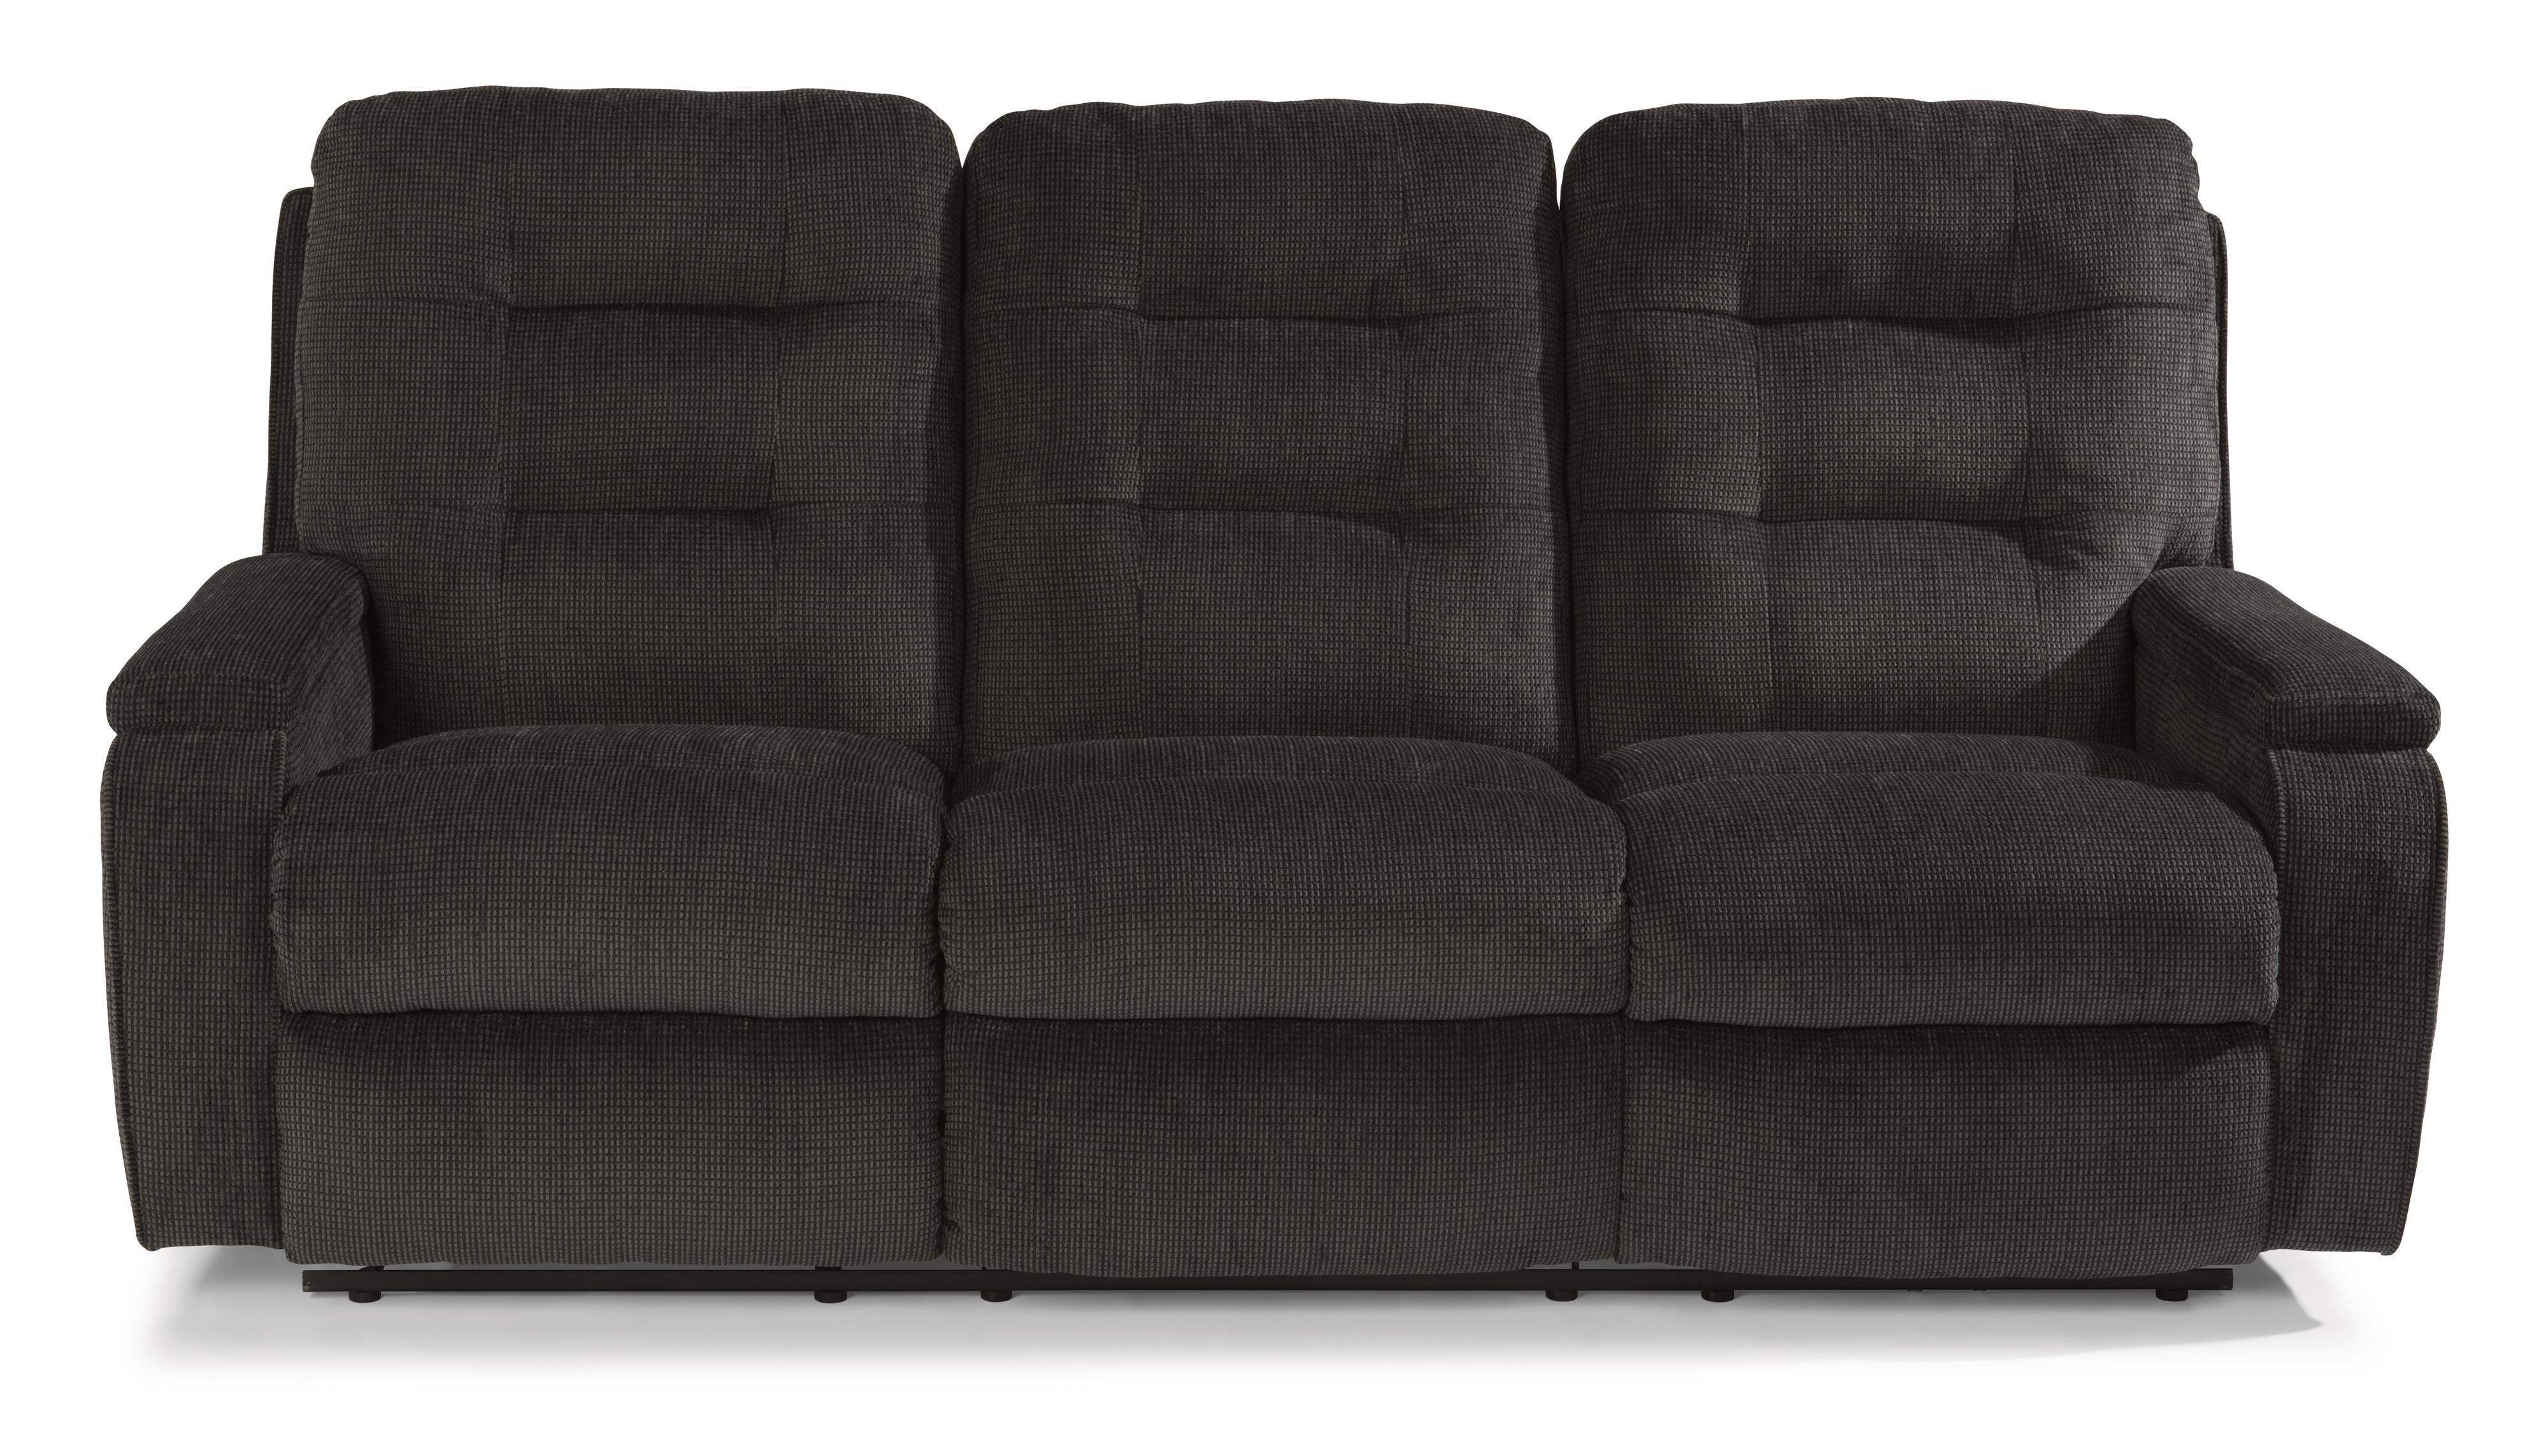 Kerrie Power Reclining Sofa by Flexsteel at Mueller Furniture